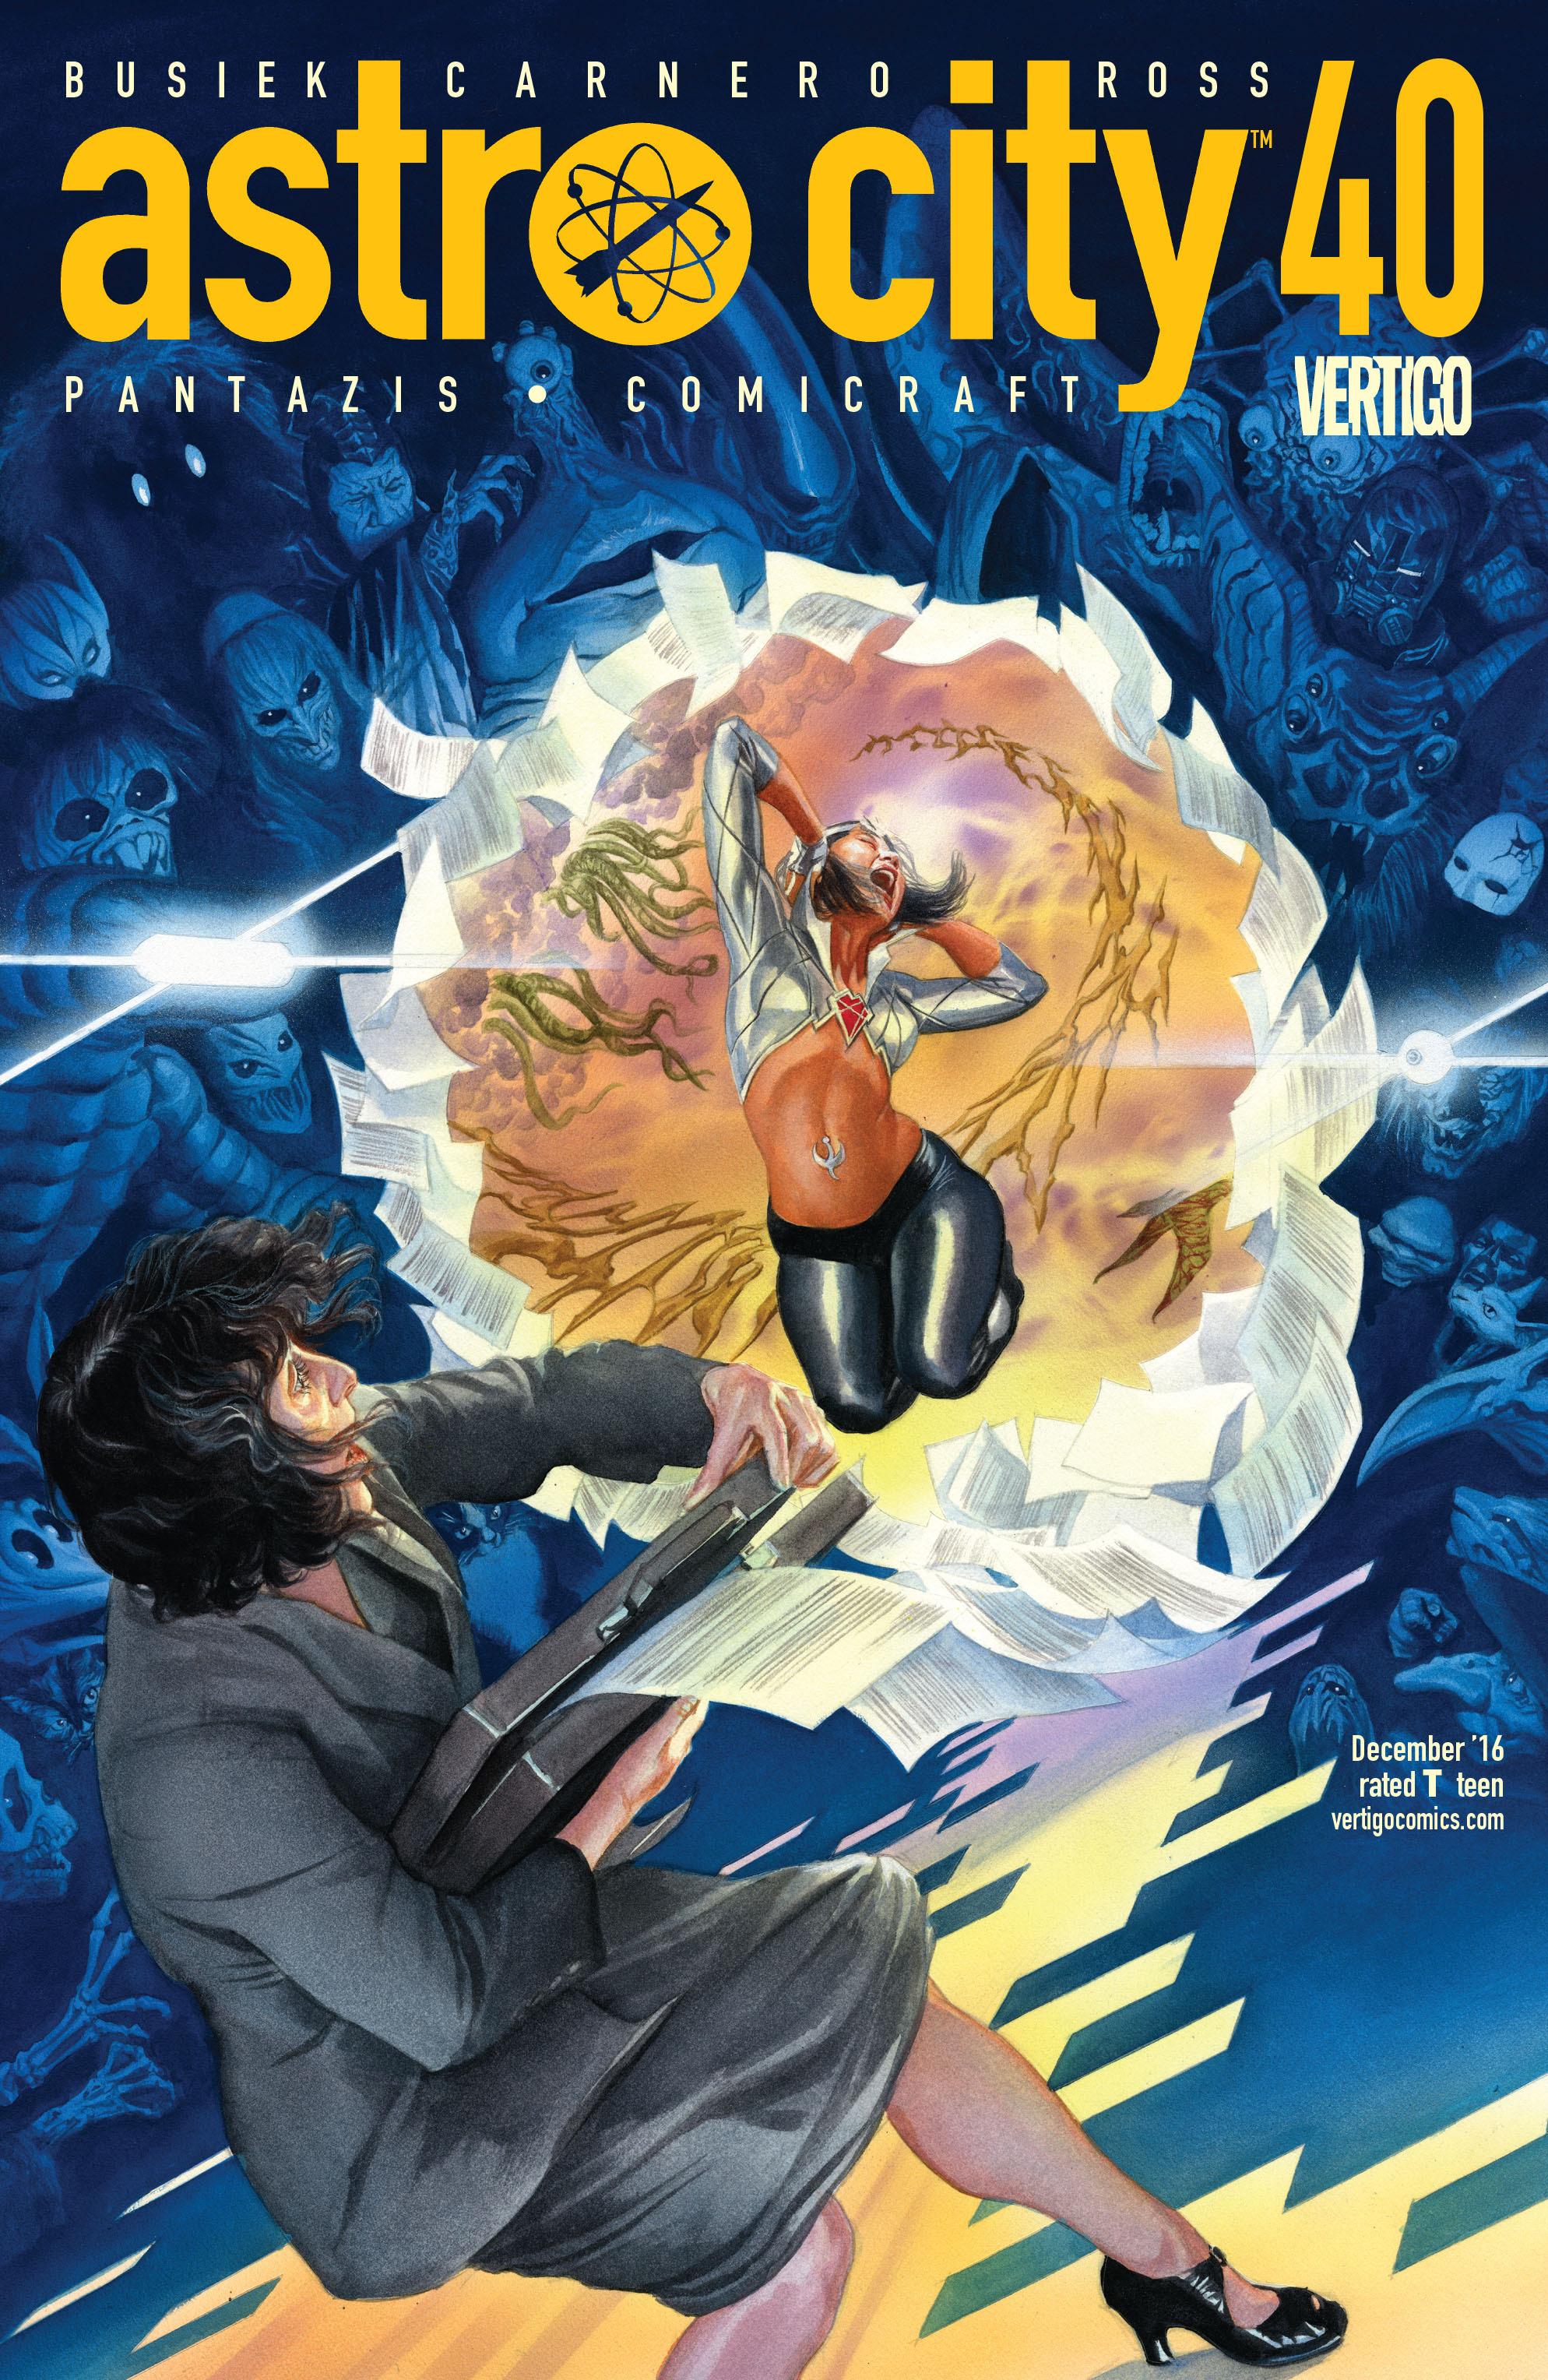 Read online Astro City comic -  Issue #40 - 1